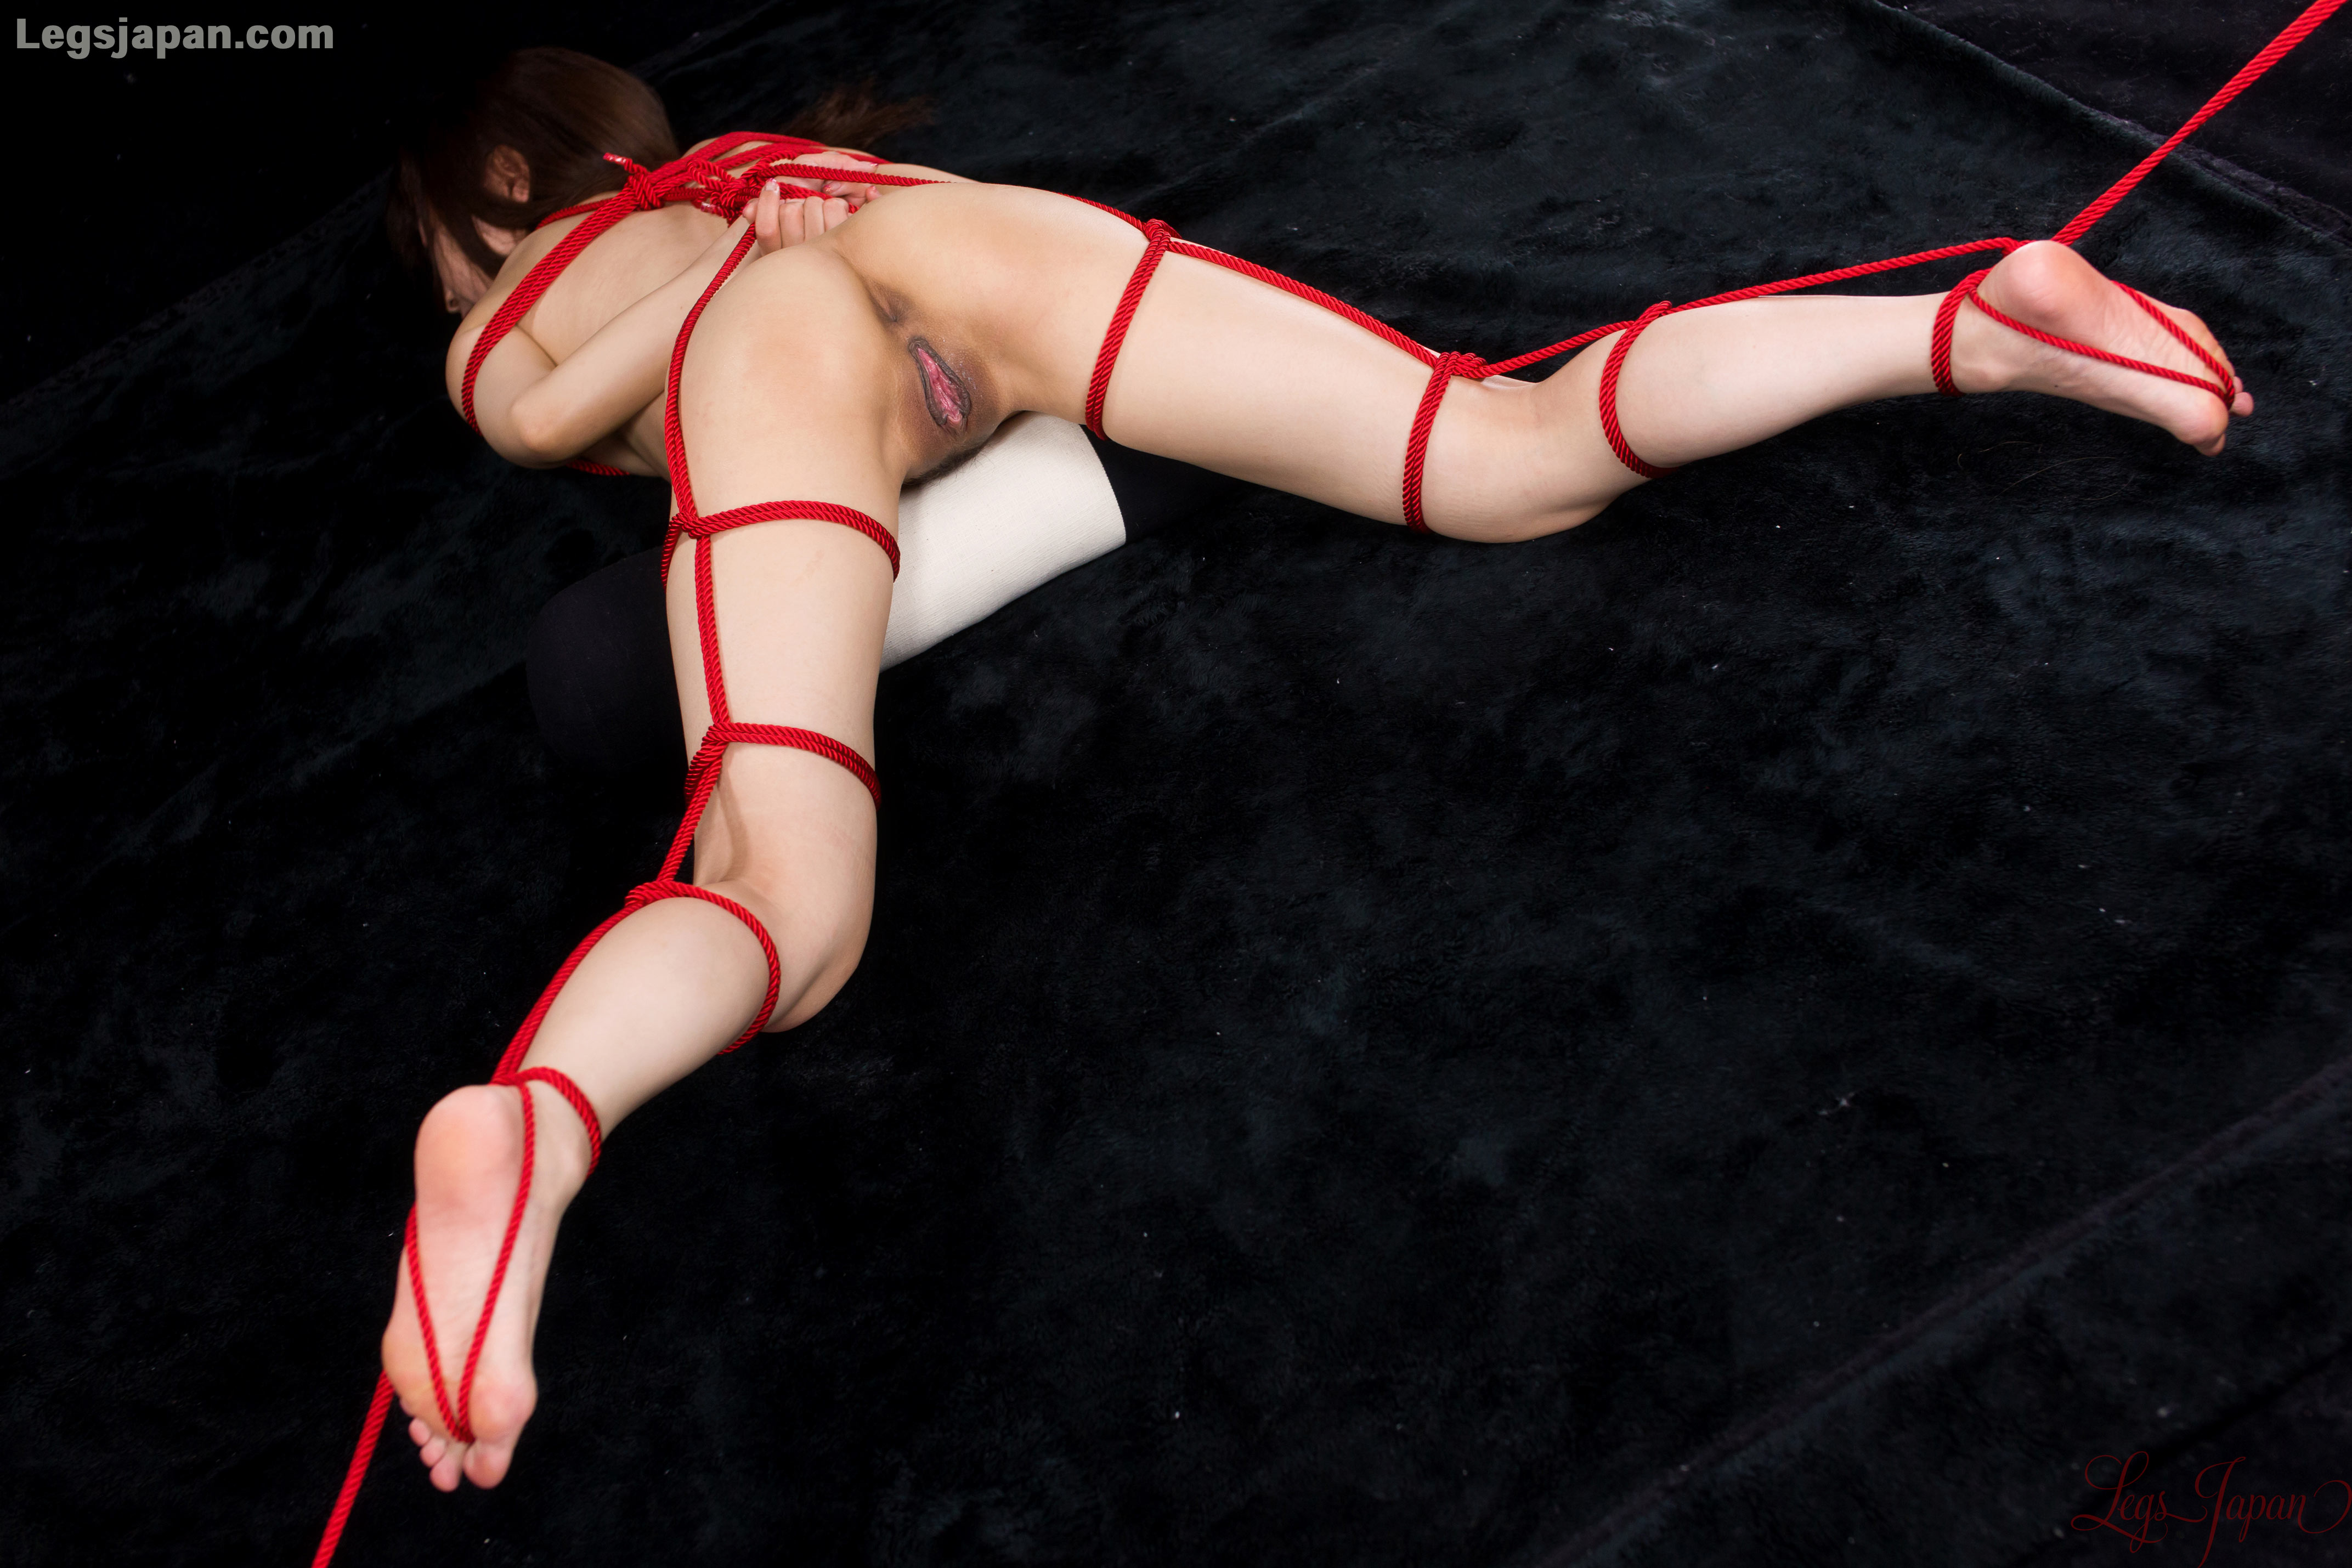 Asian, Ass, Bondage, Brunette, Floor, Solo picture featuring Shizuka Maeshiro